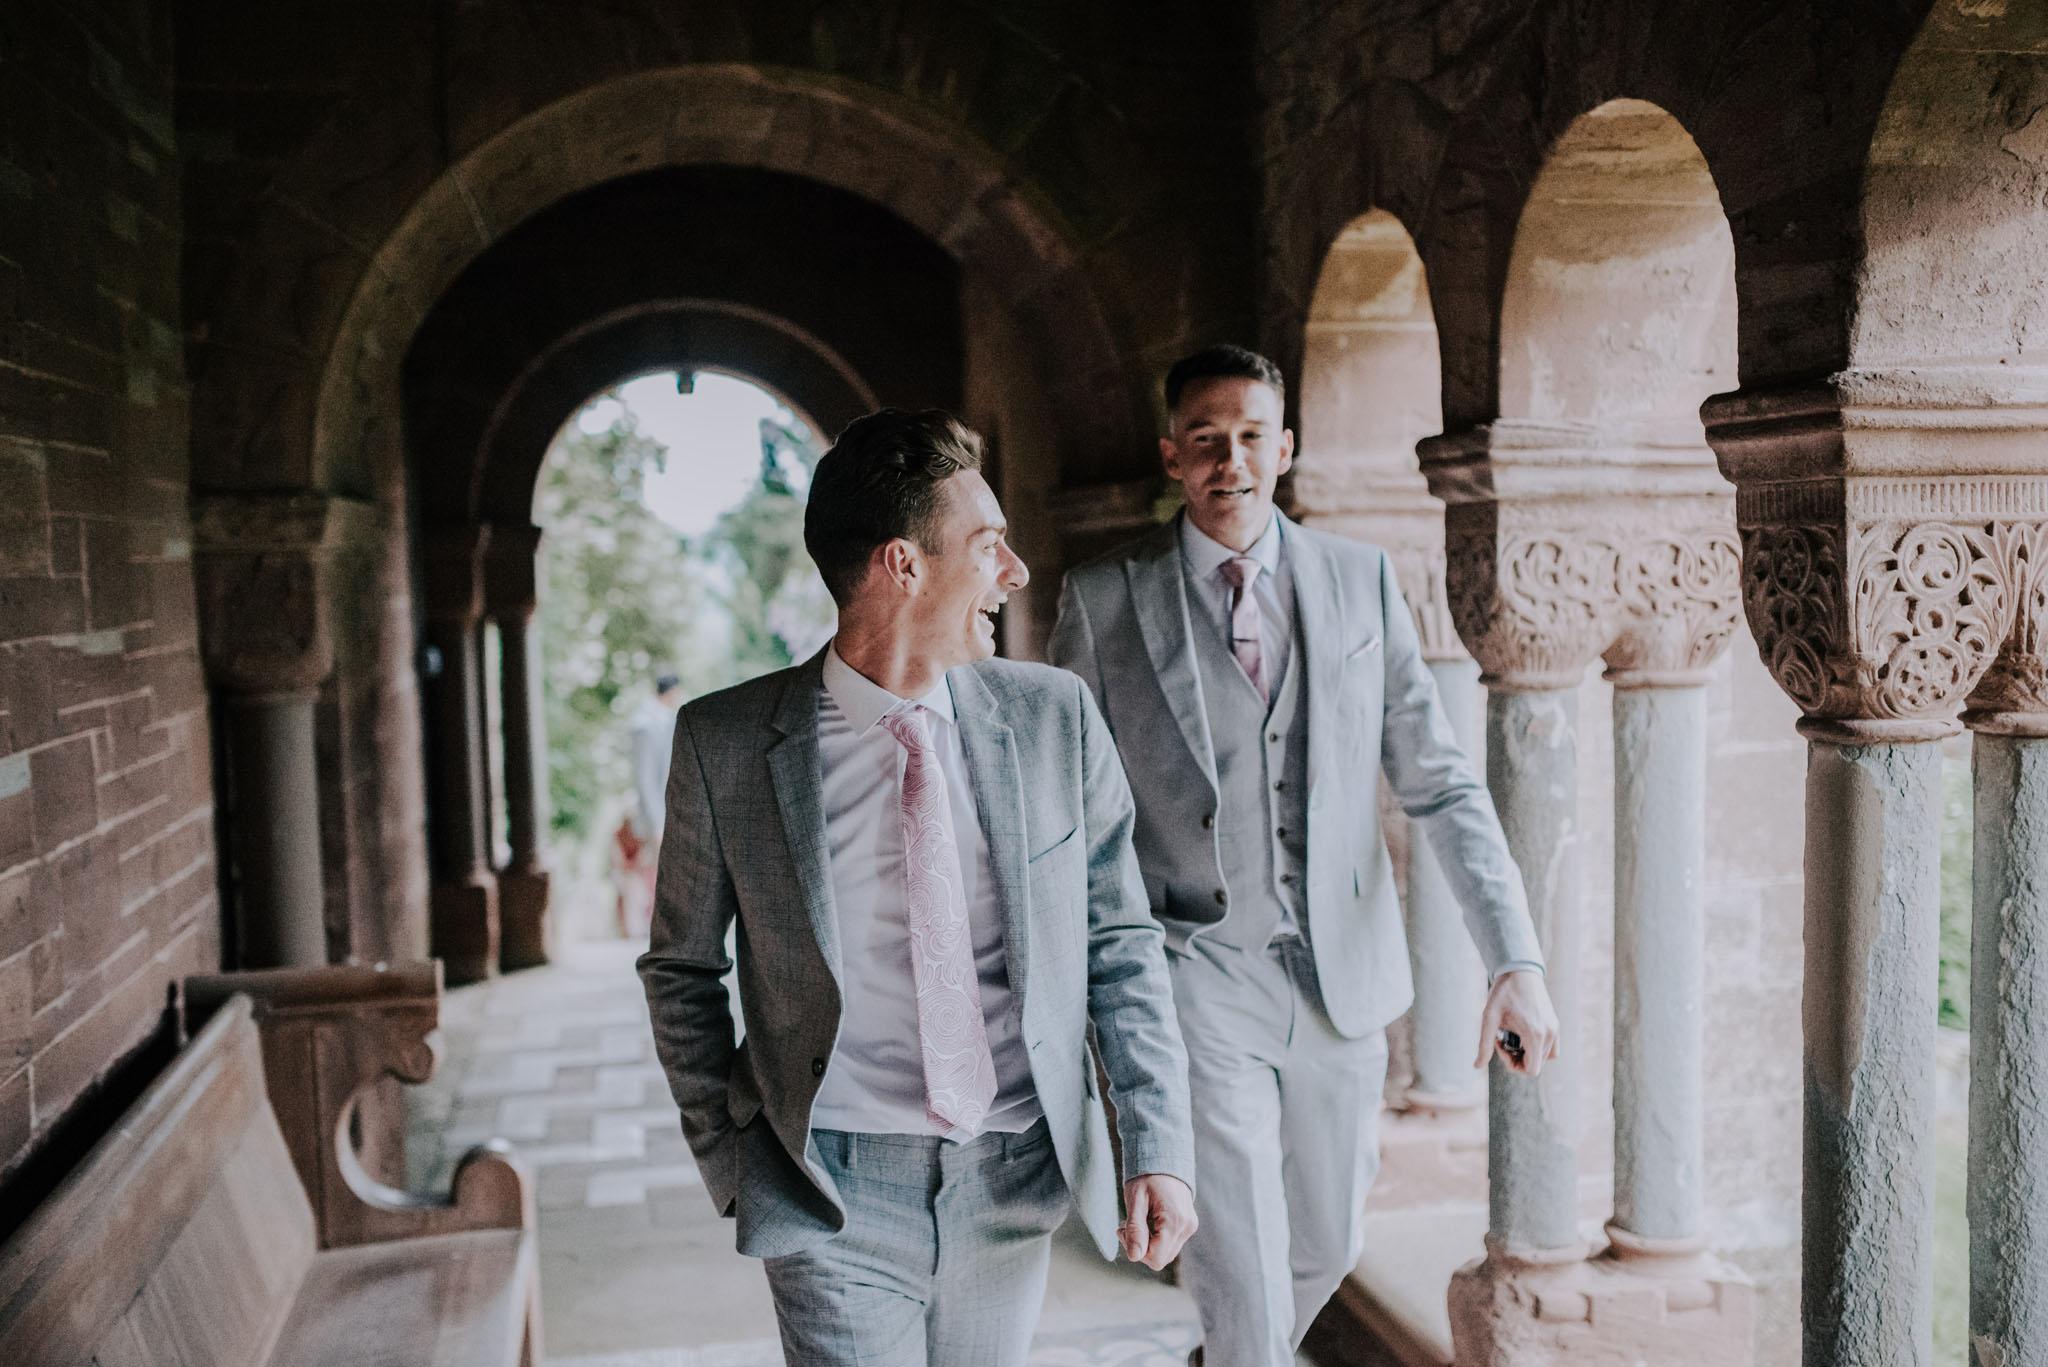 wedding-photographer-glewstone-court-hereford-scott-stockwell-photography101.jpg